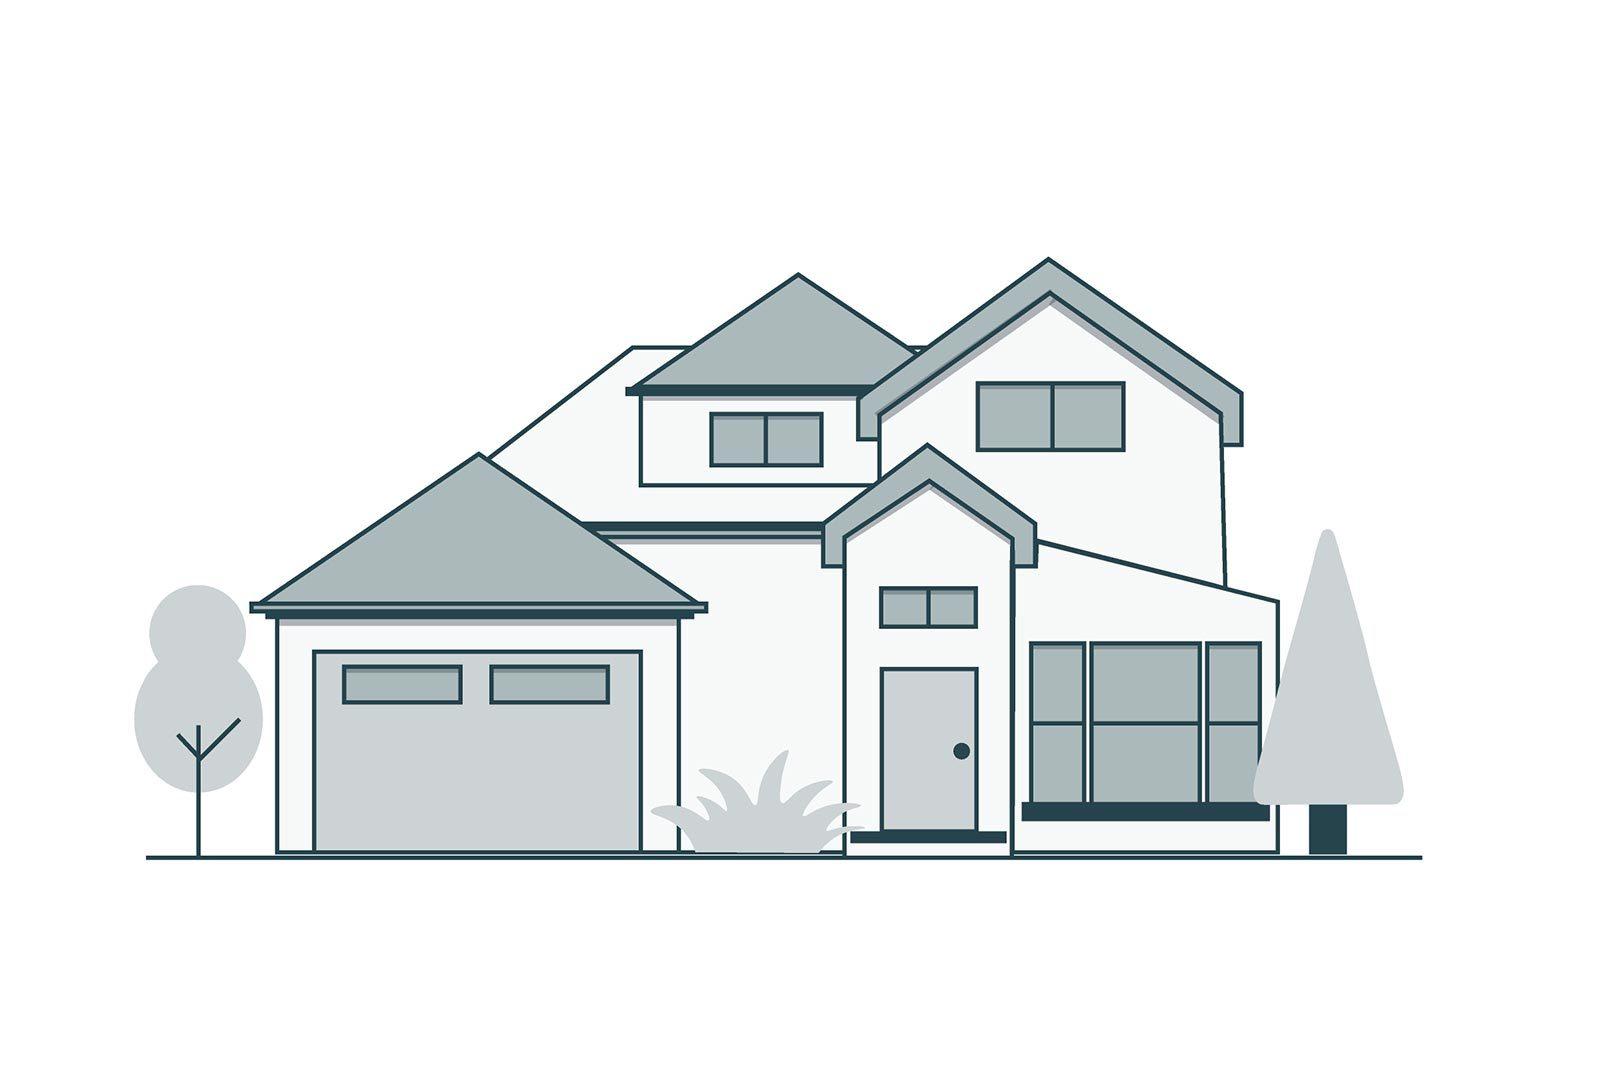 4441 Courtyard Way Antelope, CA 95843